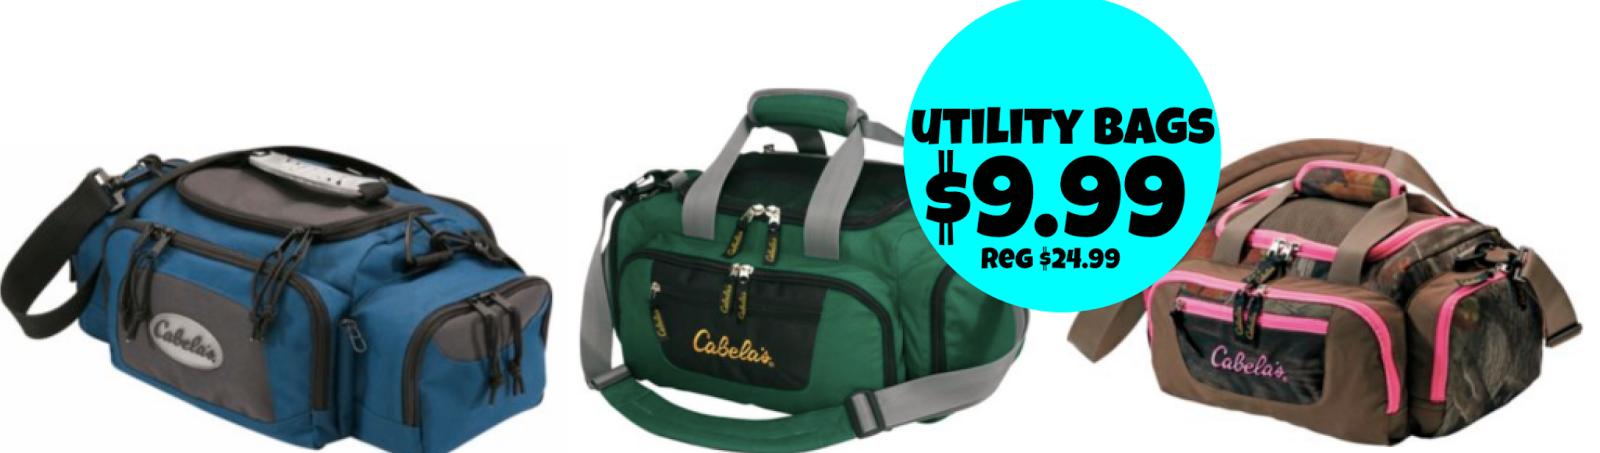 http://www.thebinderladies.com/2014/11/cabelas-gear-utility-bags-lots-of.html#.VG5HcofduyM